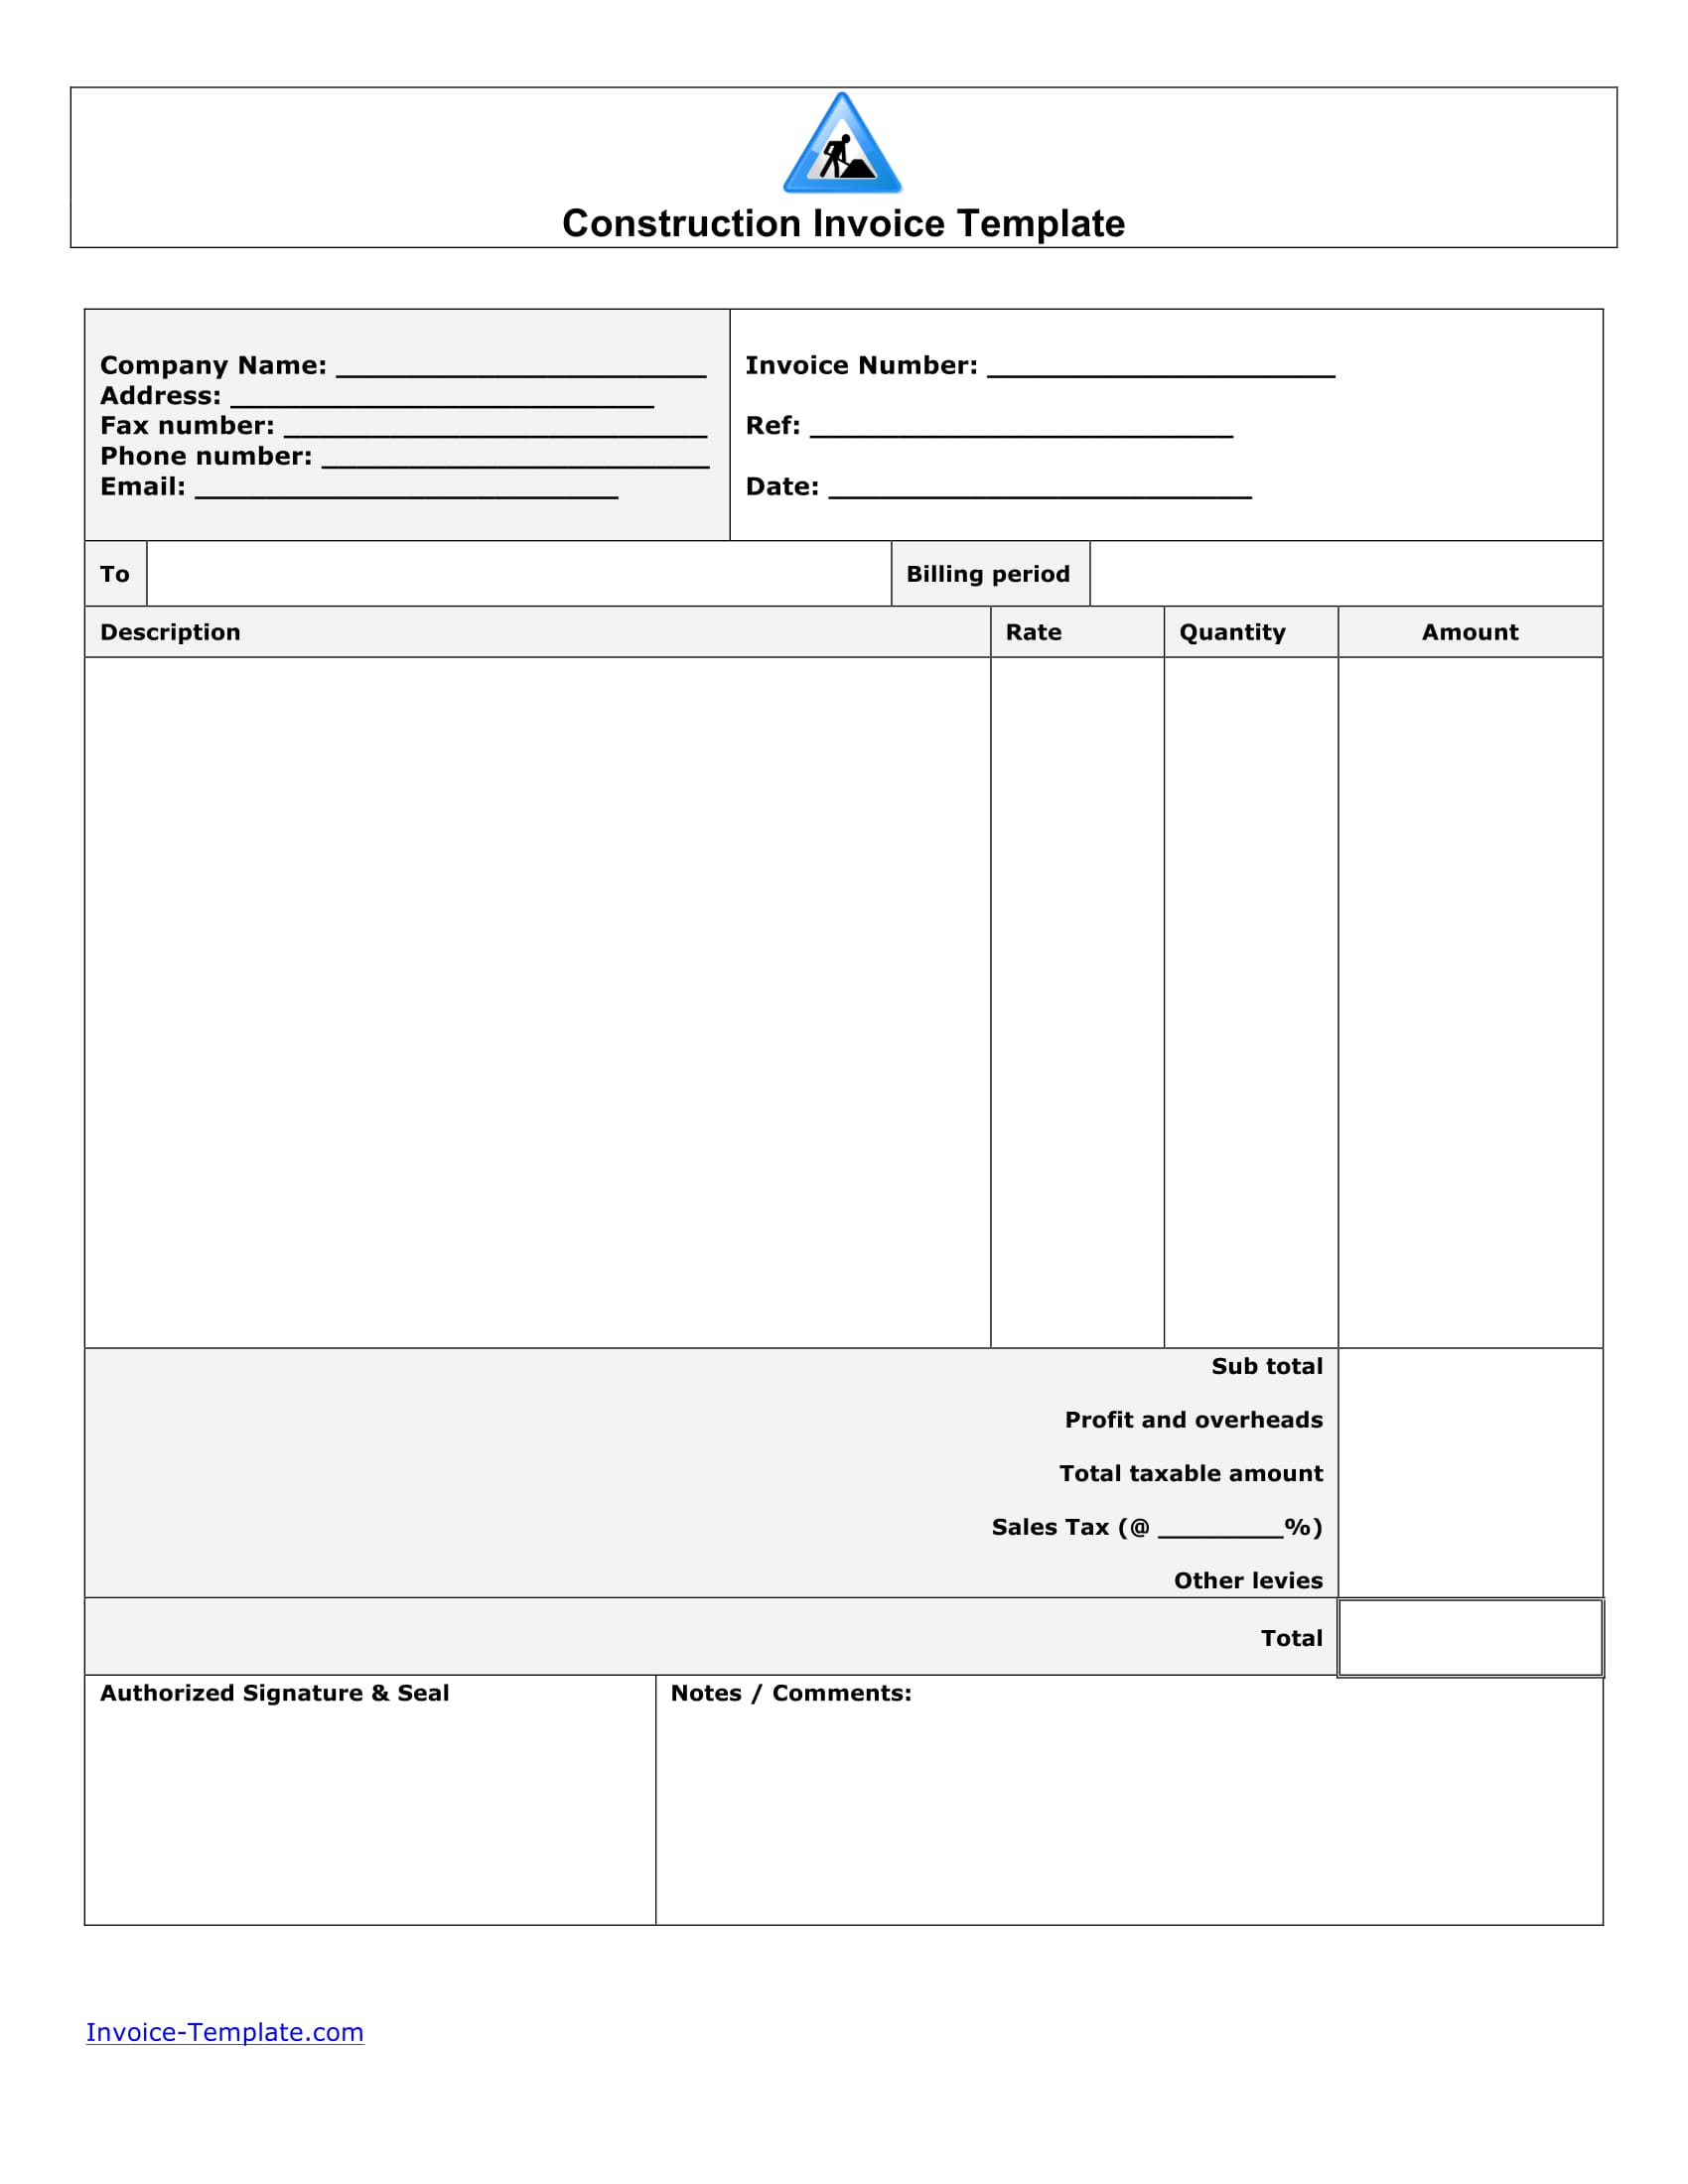 construction invoice form 1